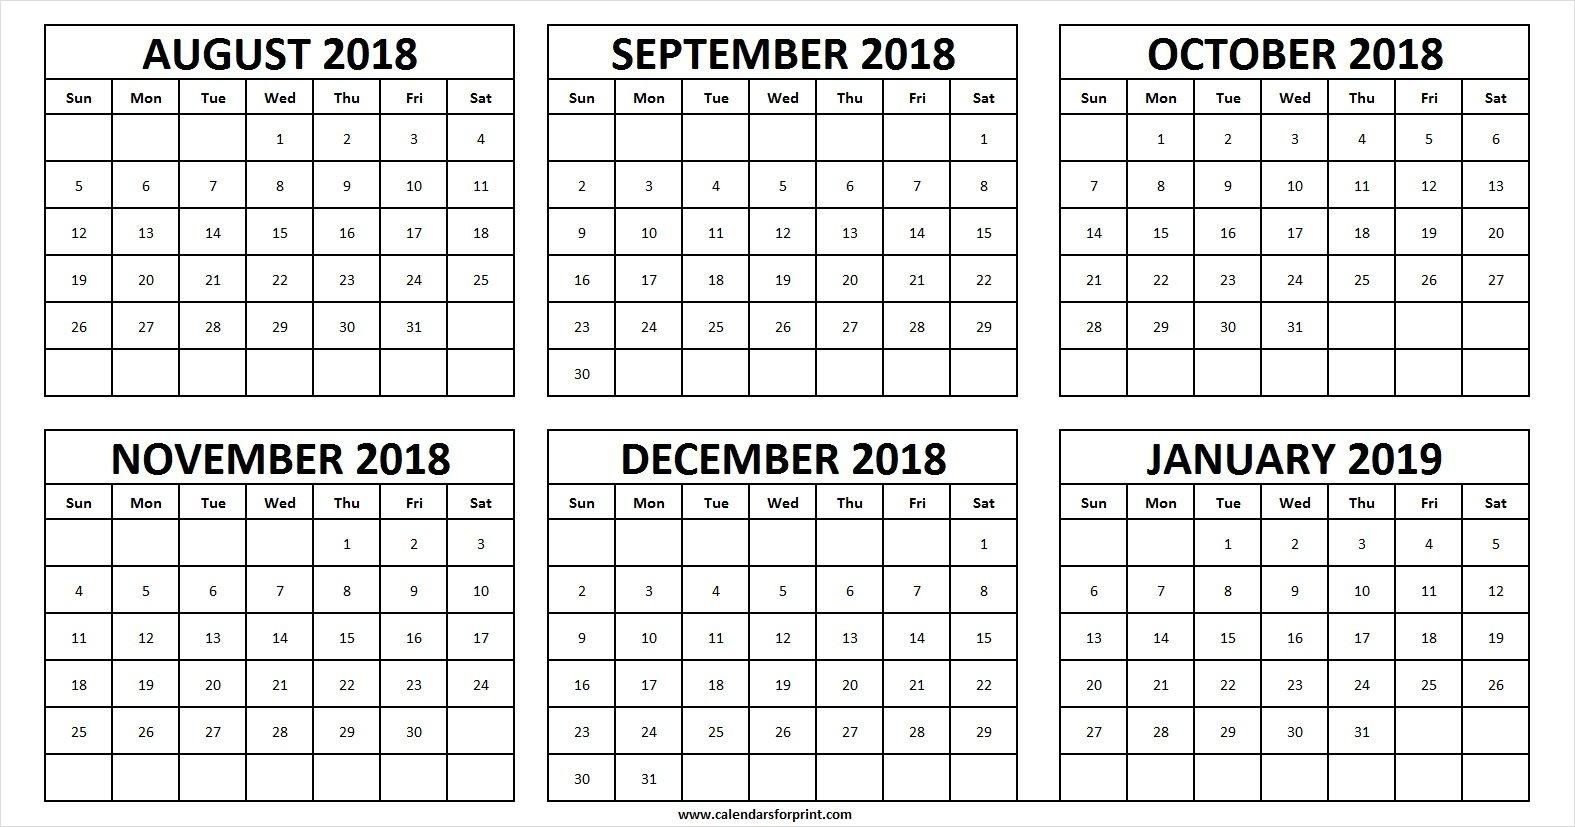 Calendar 2018 August To December Printable | Calendar Format Example inside Calander From August - December